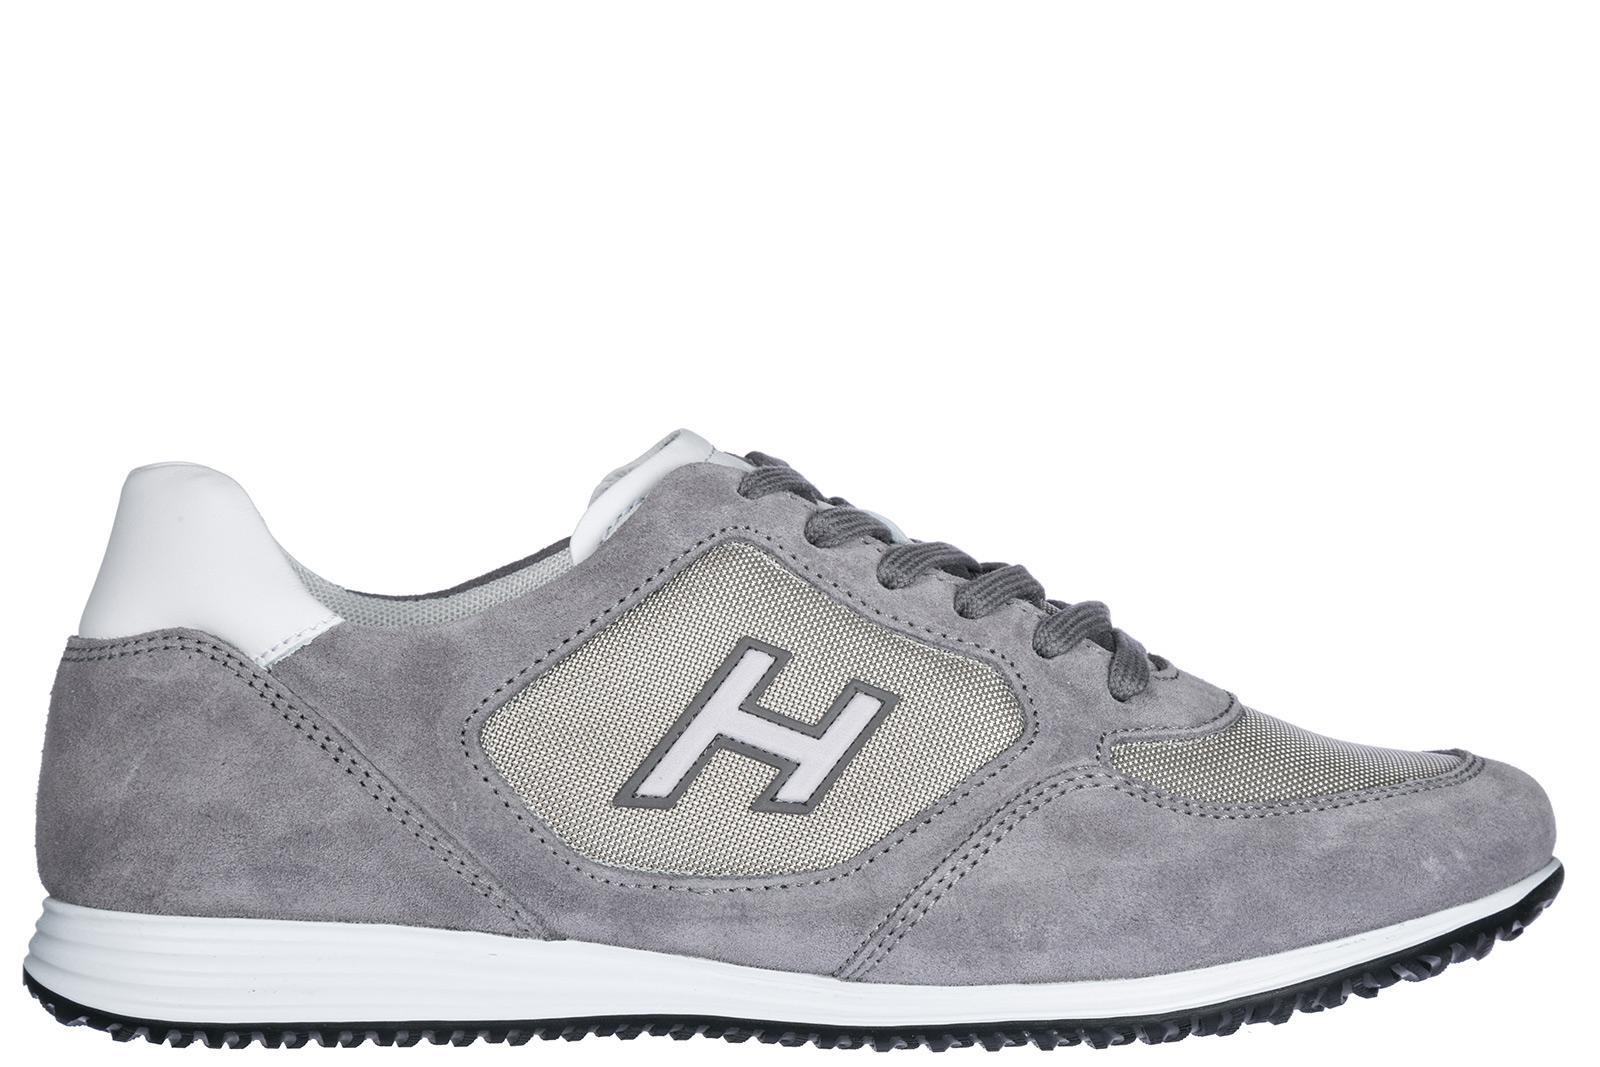 Sneaker H205 suede Logo light grey Hogan aTgc5ibA5